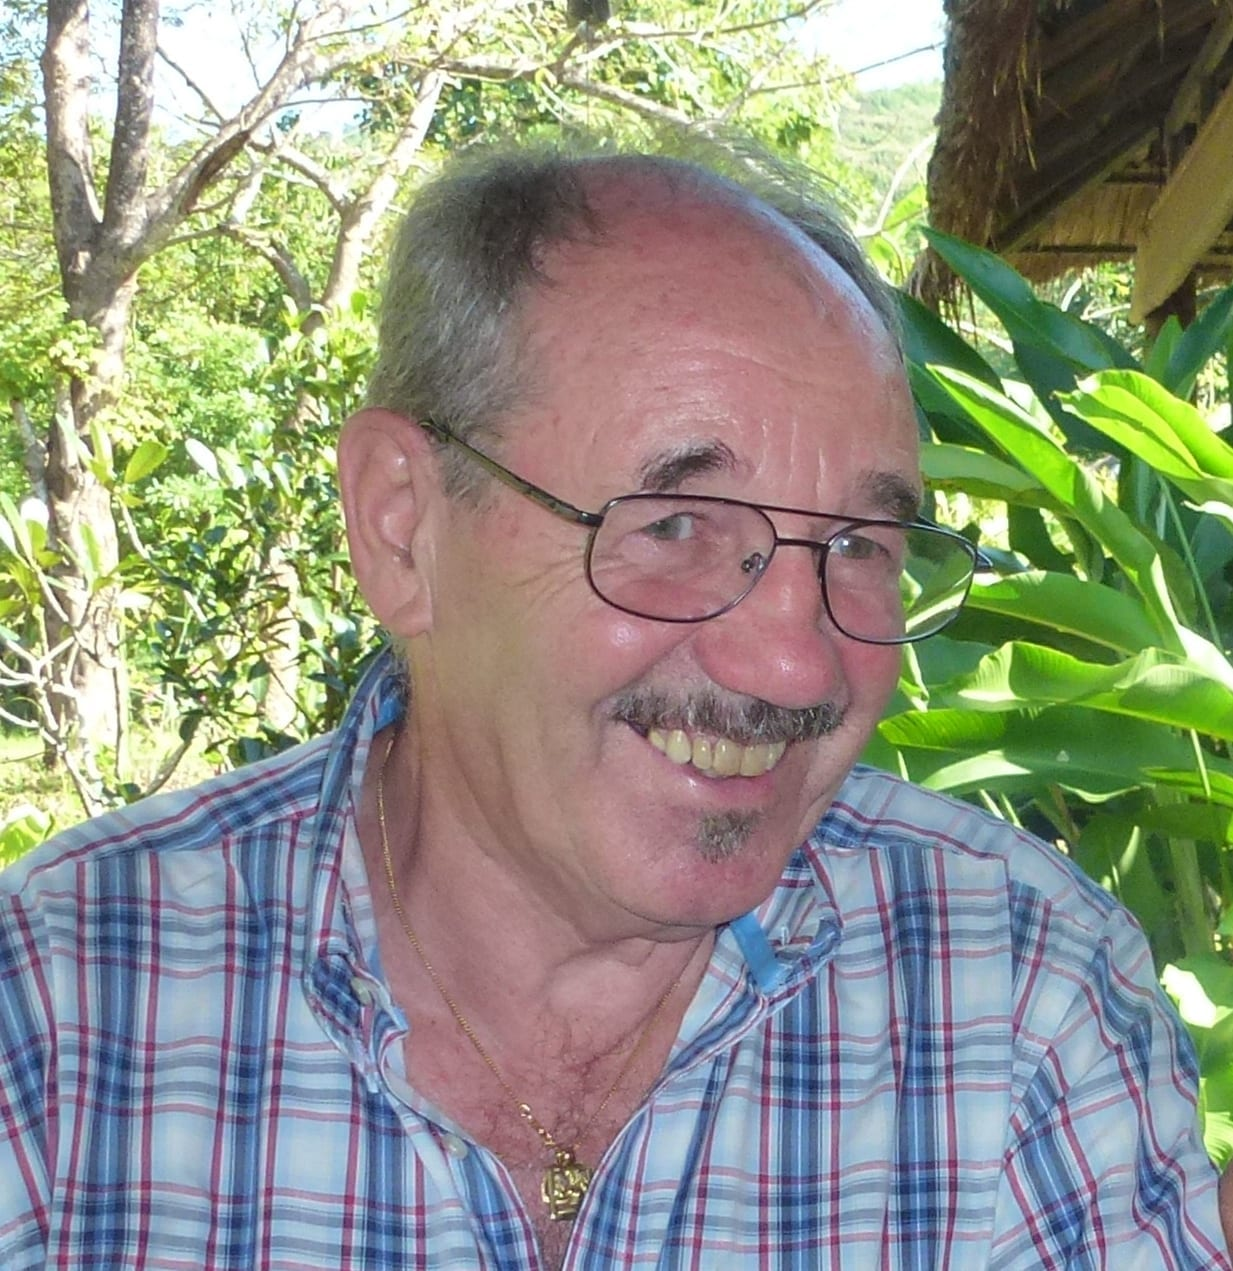 Peter Gisin